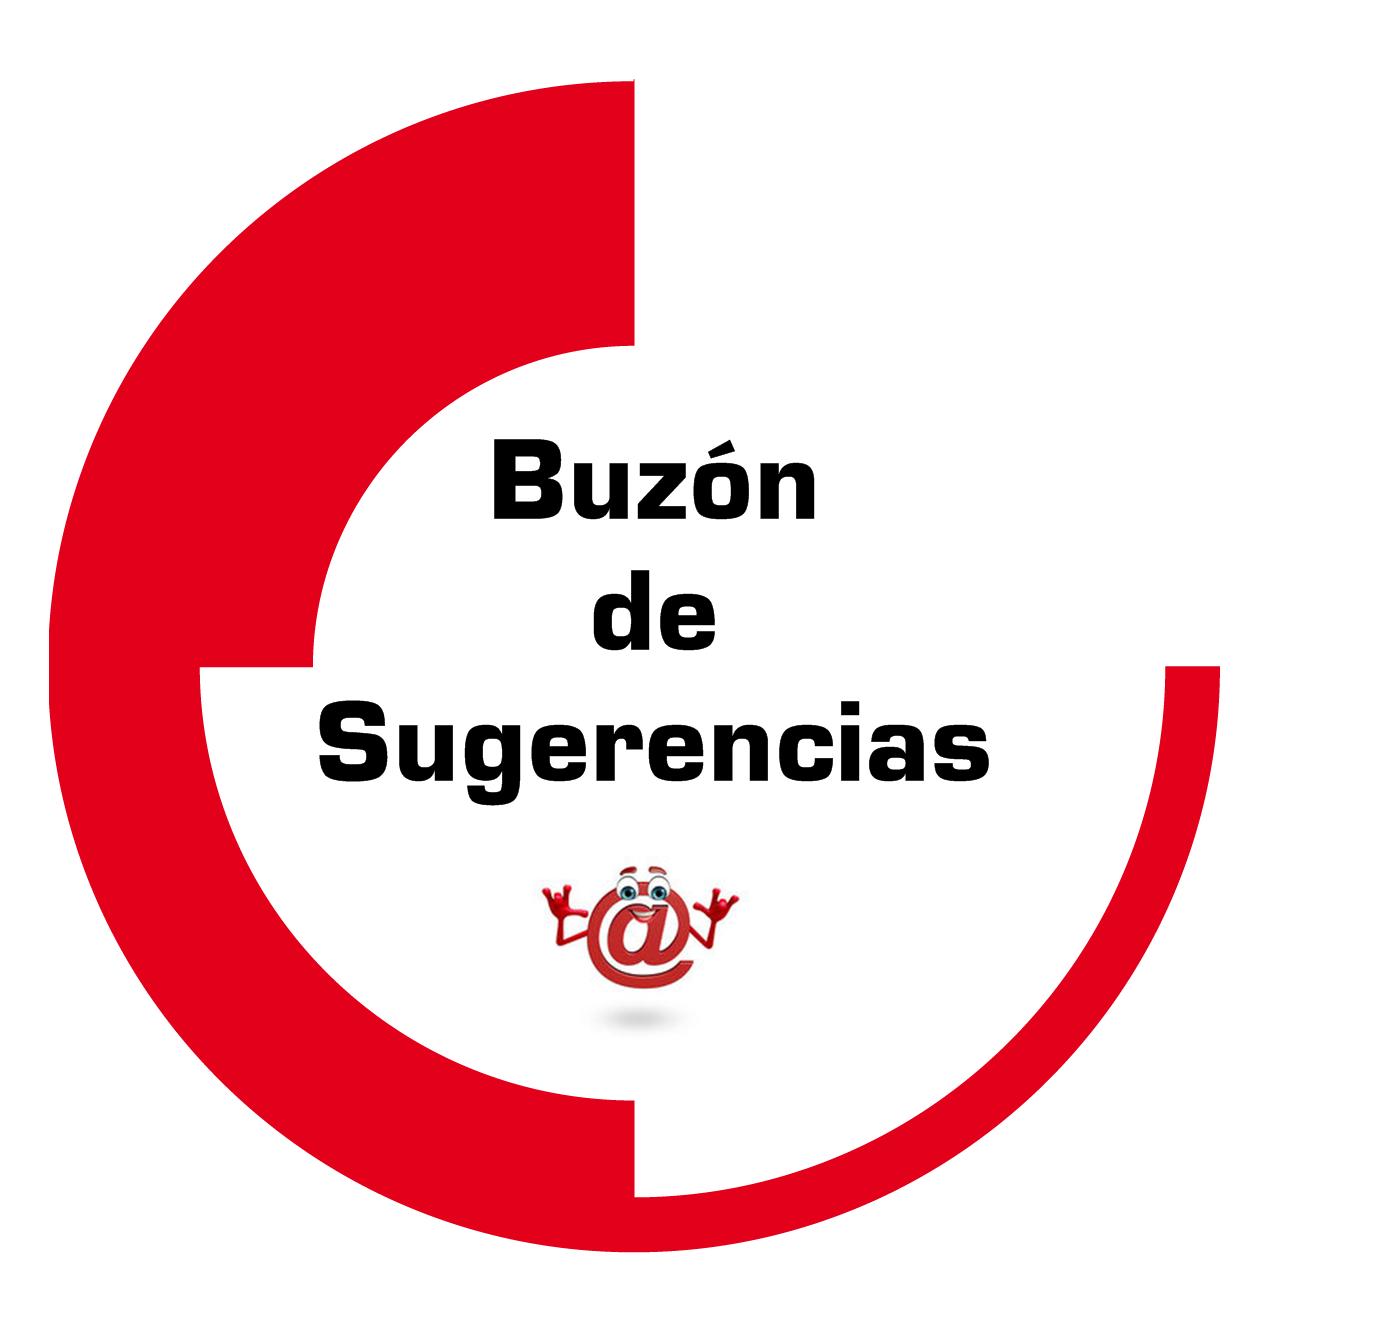 Buzon de Sugerencias temporada 2017